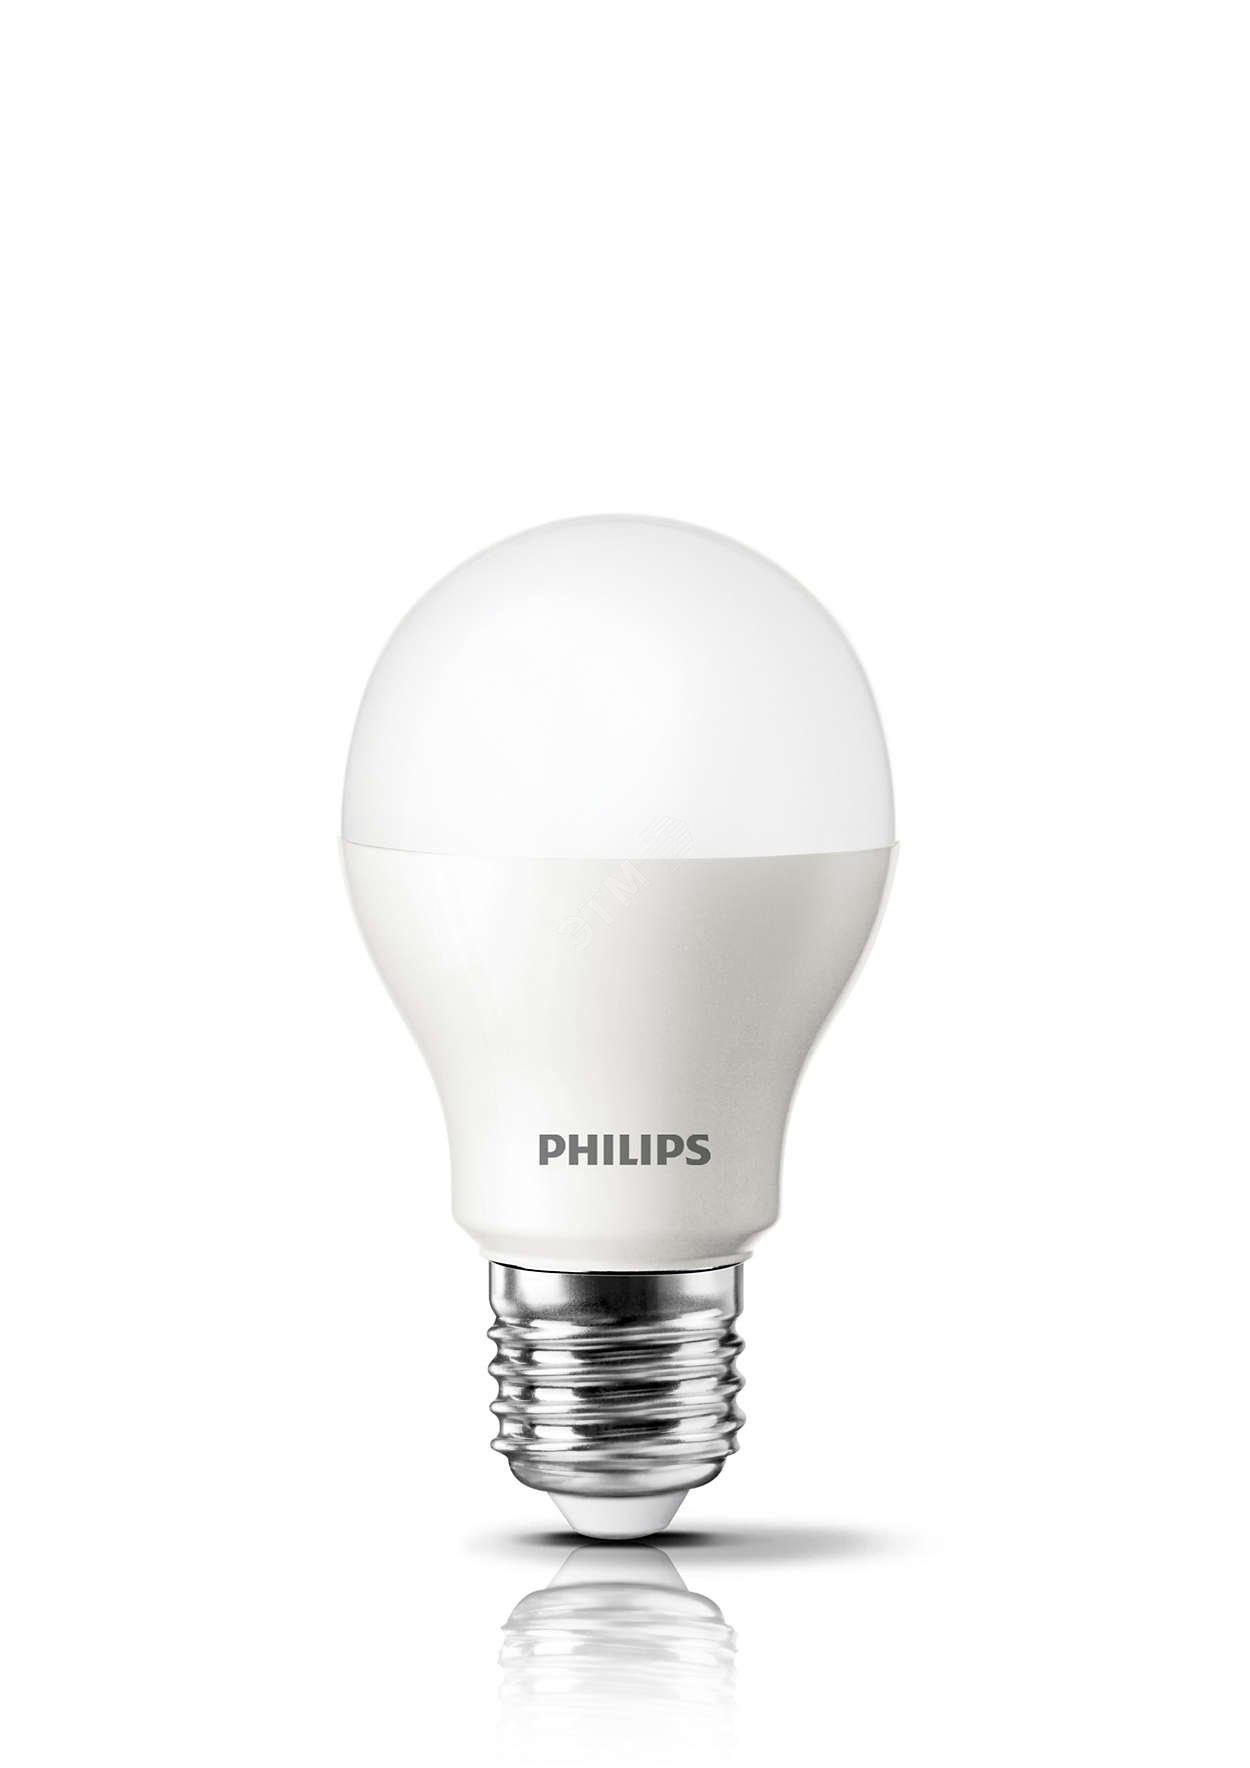 Лампочка Philips 871869673745300, Холодный свет 5 Вт светодиодная лампа philips ess ledbulb 5w e27 6500k 230v a60